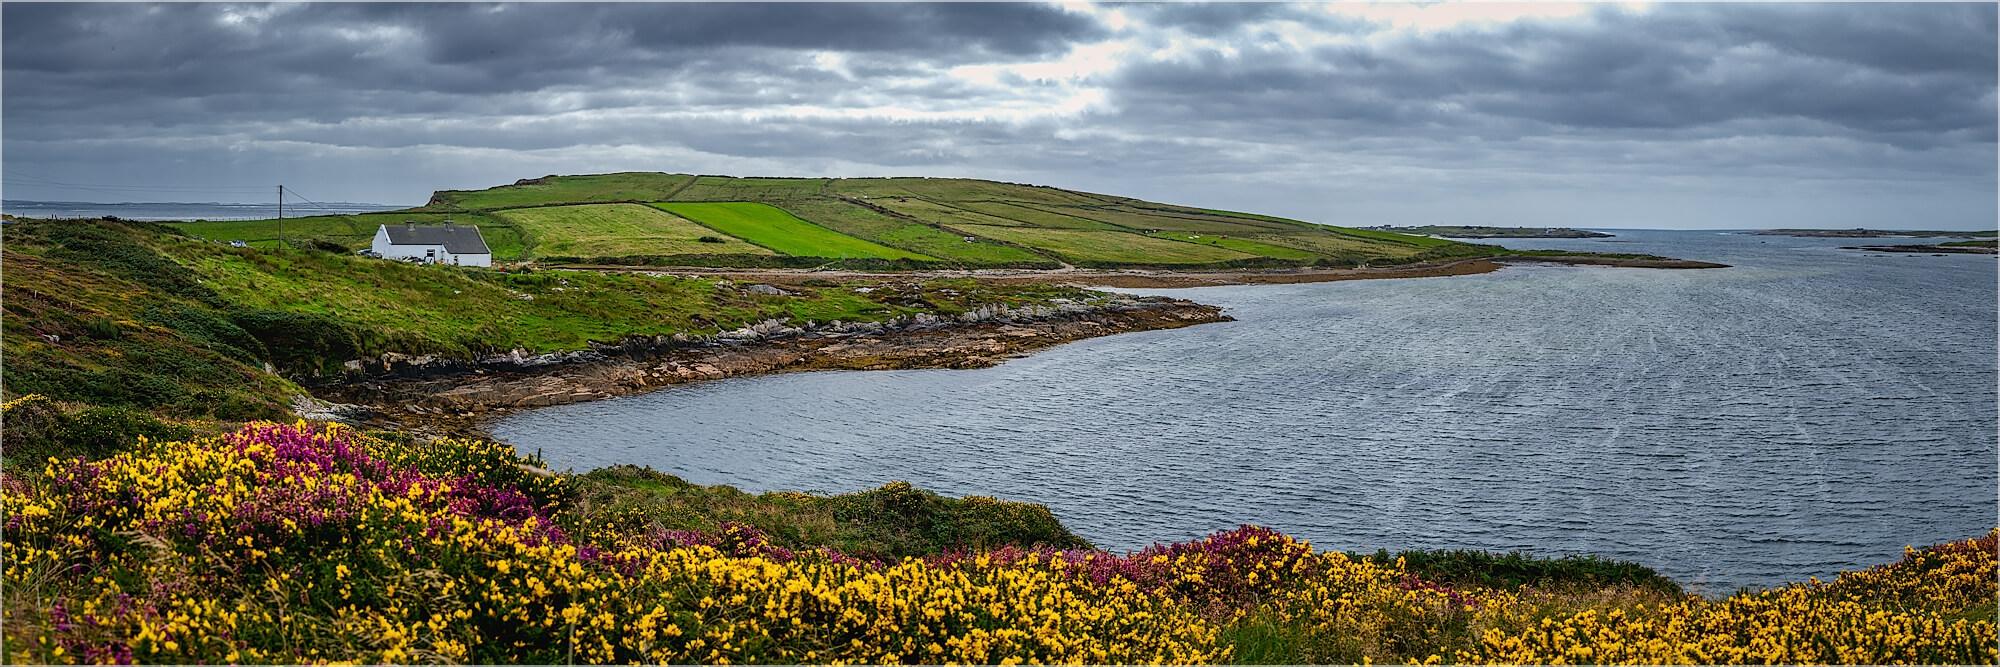 Panoramafoto Küstenlandschaft Atlantik Irland